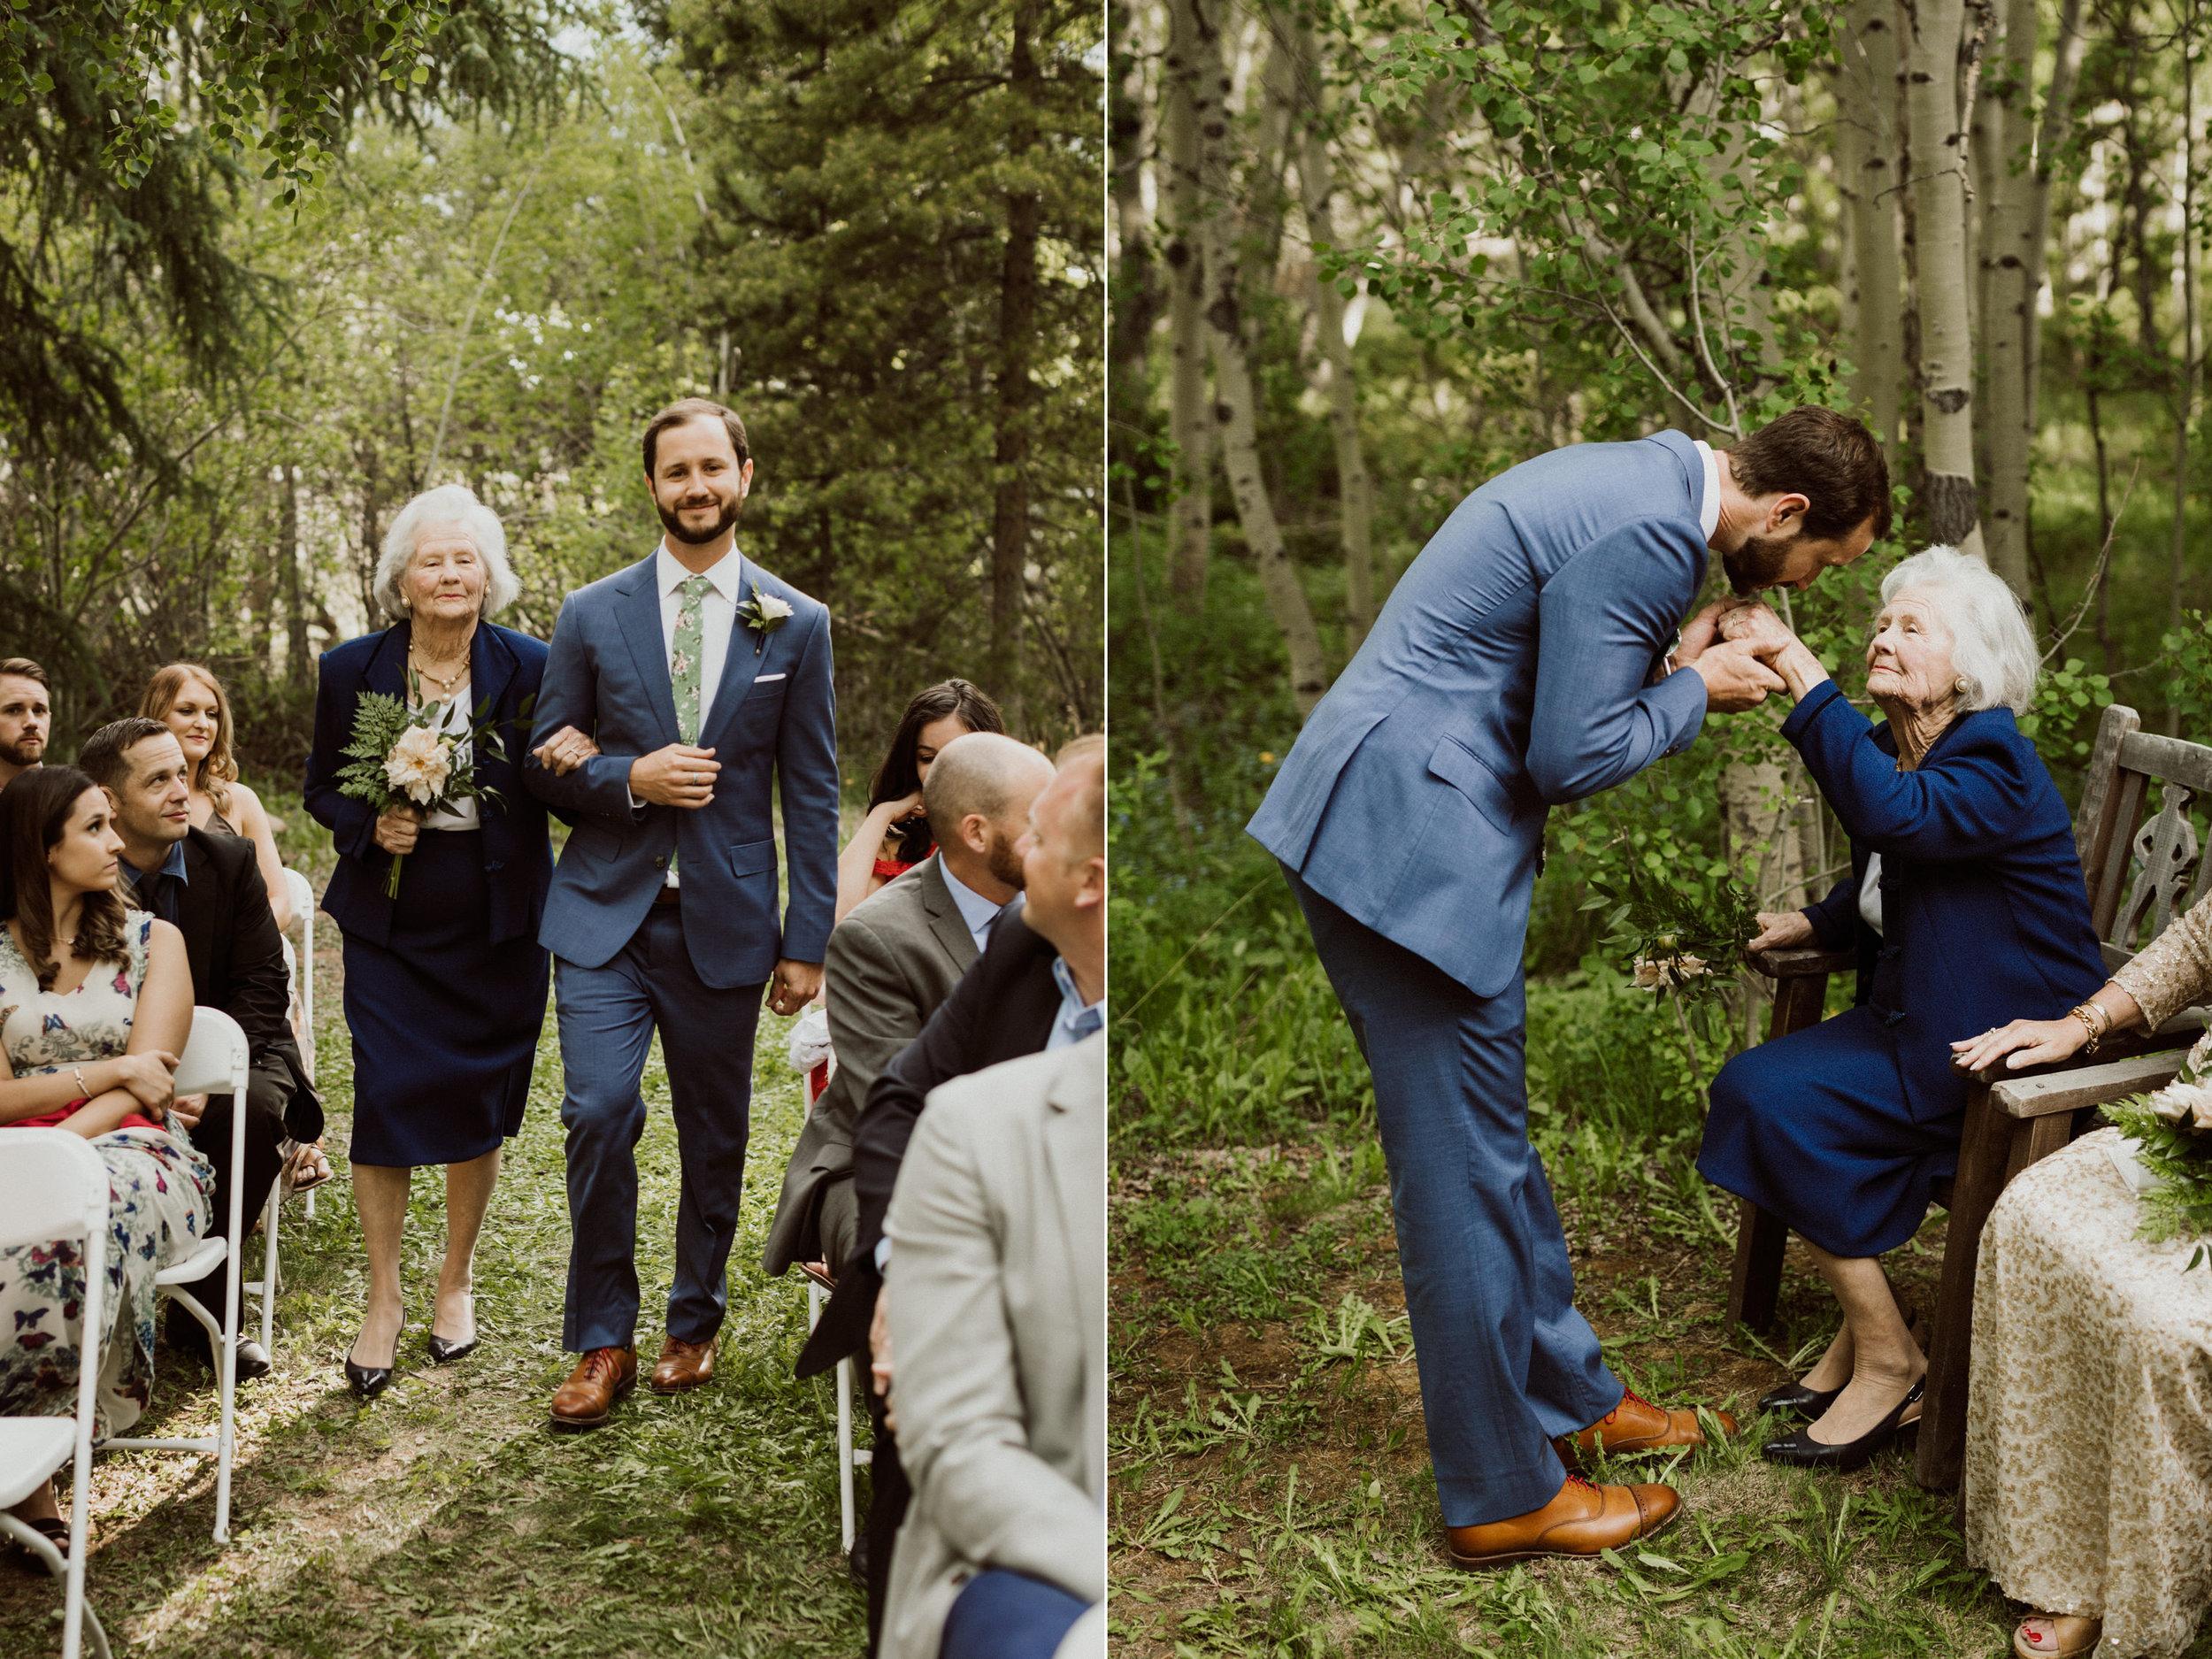 bohemian-backyard-wedding-breckenridge-colorado-167.jpg